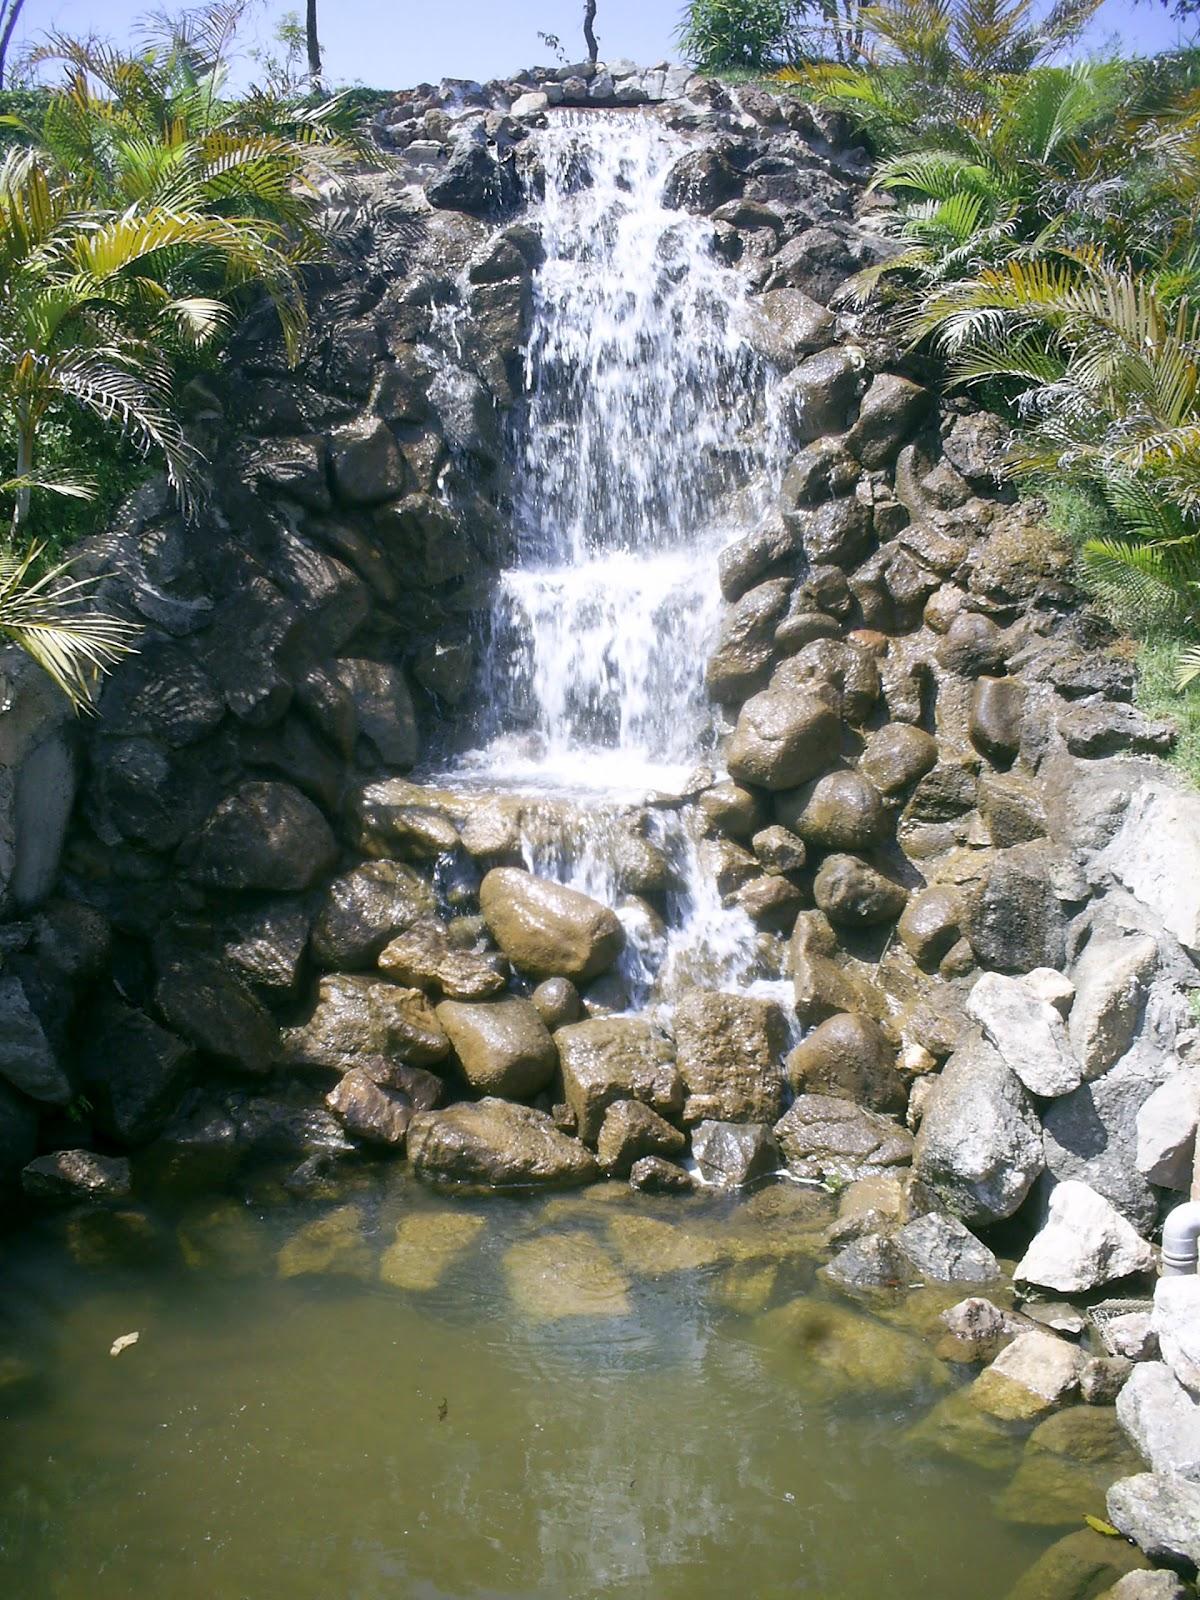 Hamilton cezar lagos cascatas e jardins no estilo for Lagos de jardin